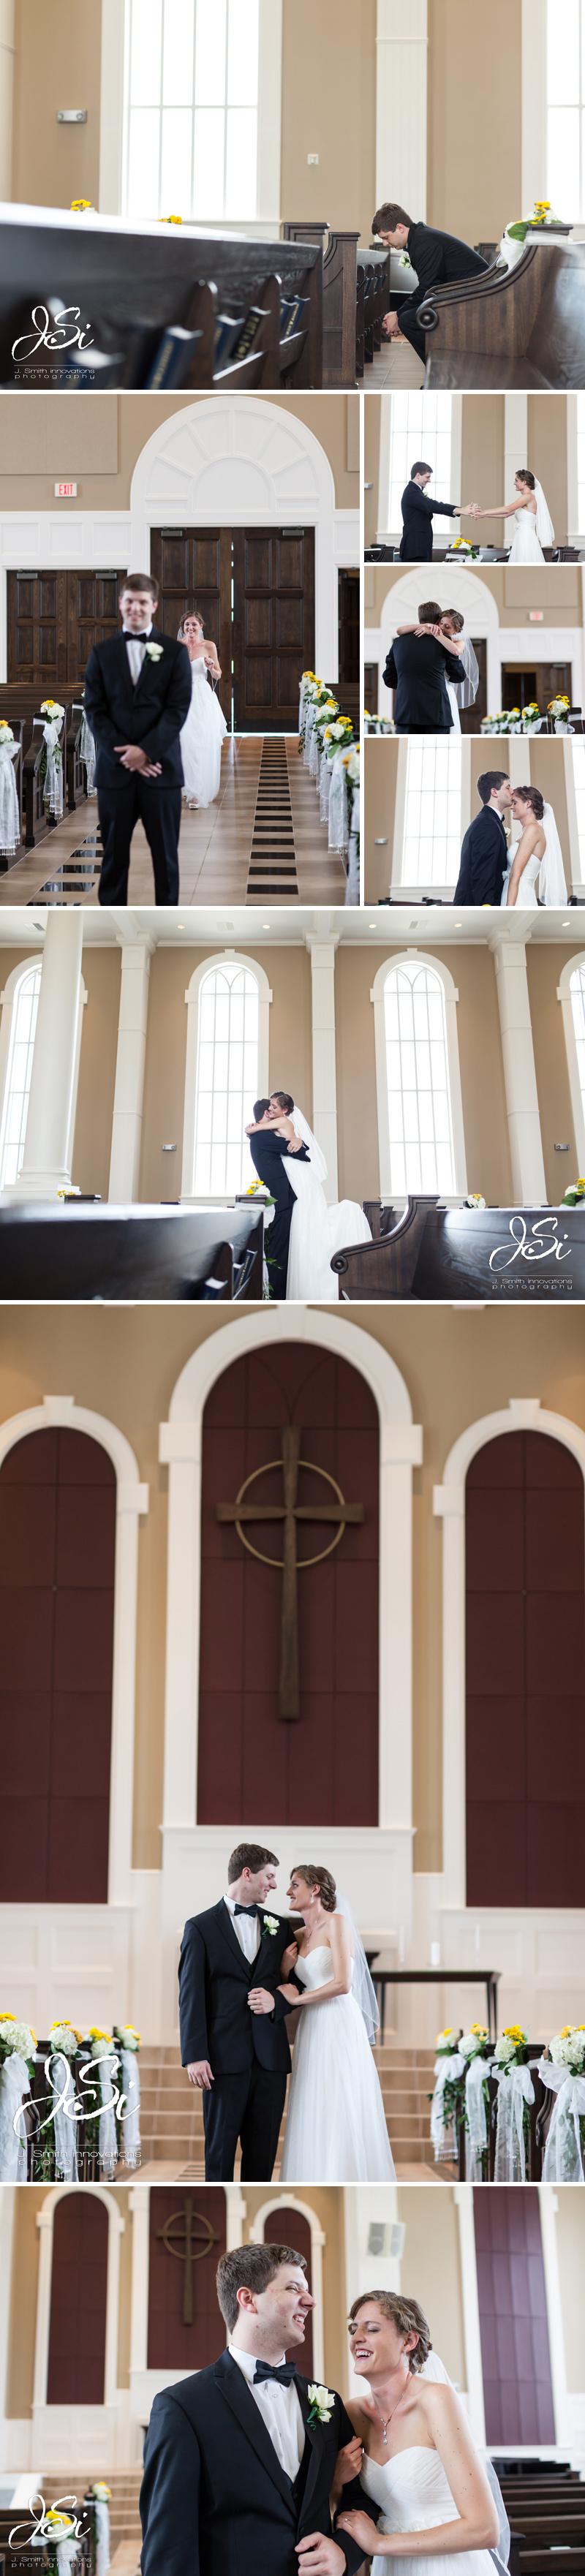 Overland Park Redeemer Presbyterian Church happy Christ centered wedding photo